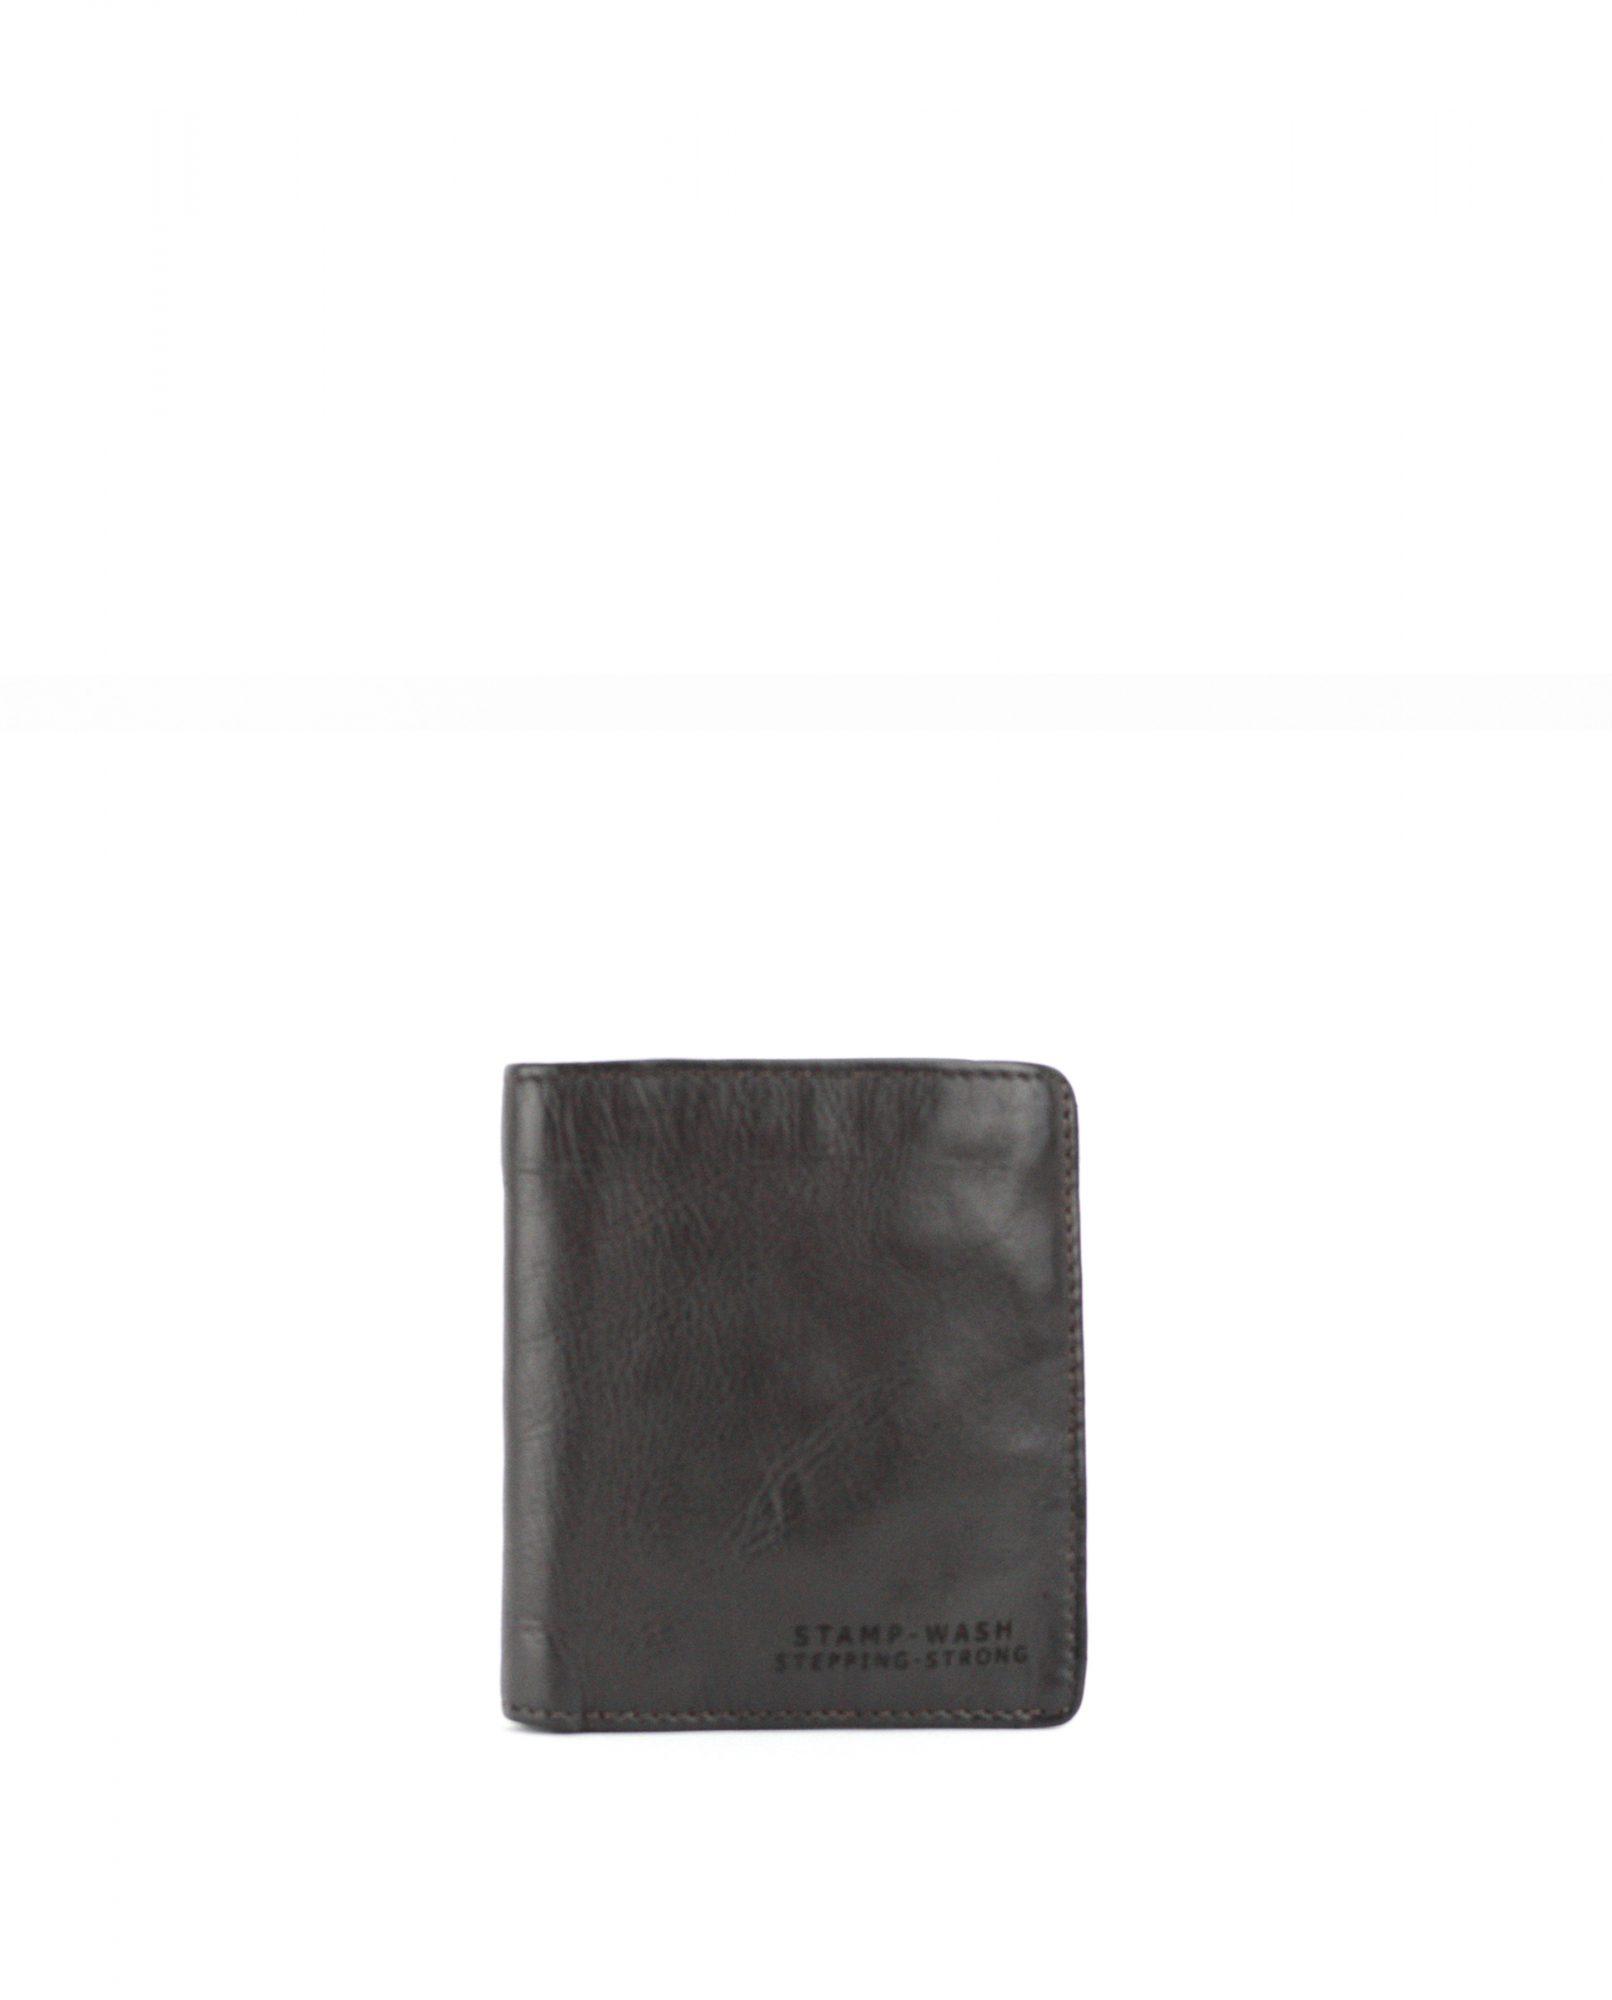 TICHI-Billetero de piel Stamp color marrón-MHST11928MA-STAMP